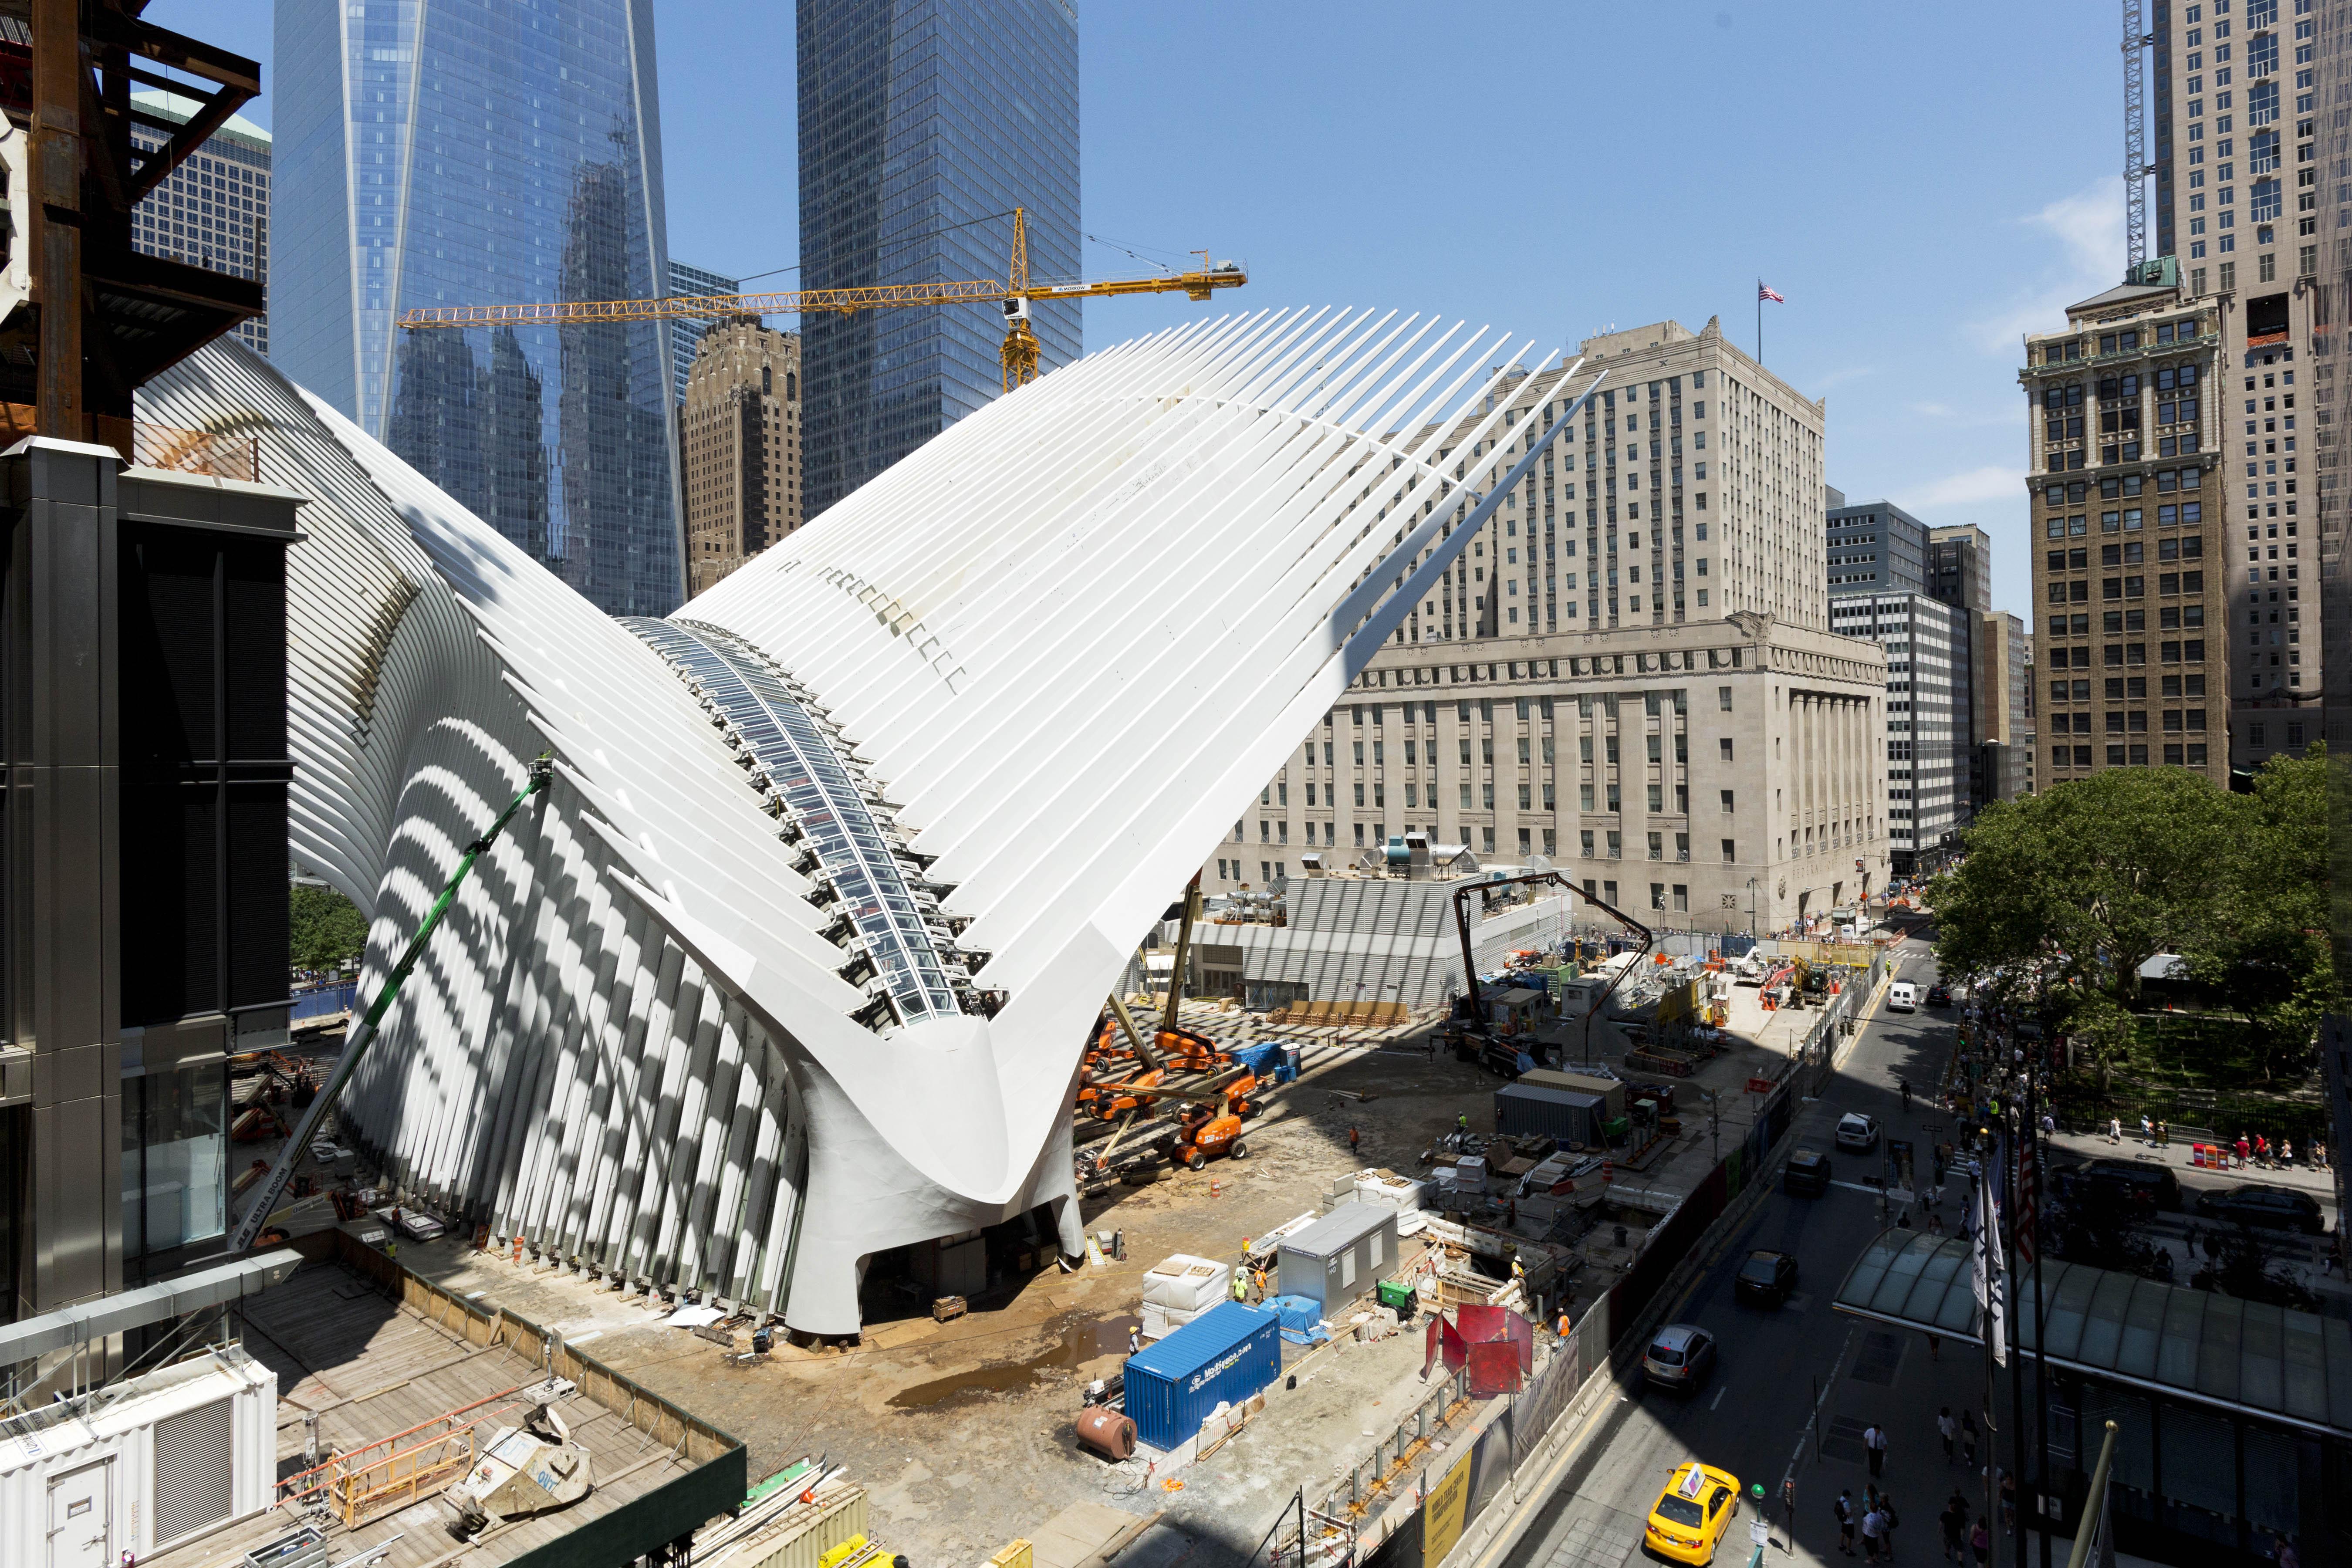 New York World Trade Center Transit Hub Opens Under